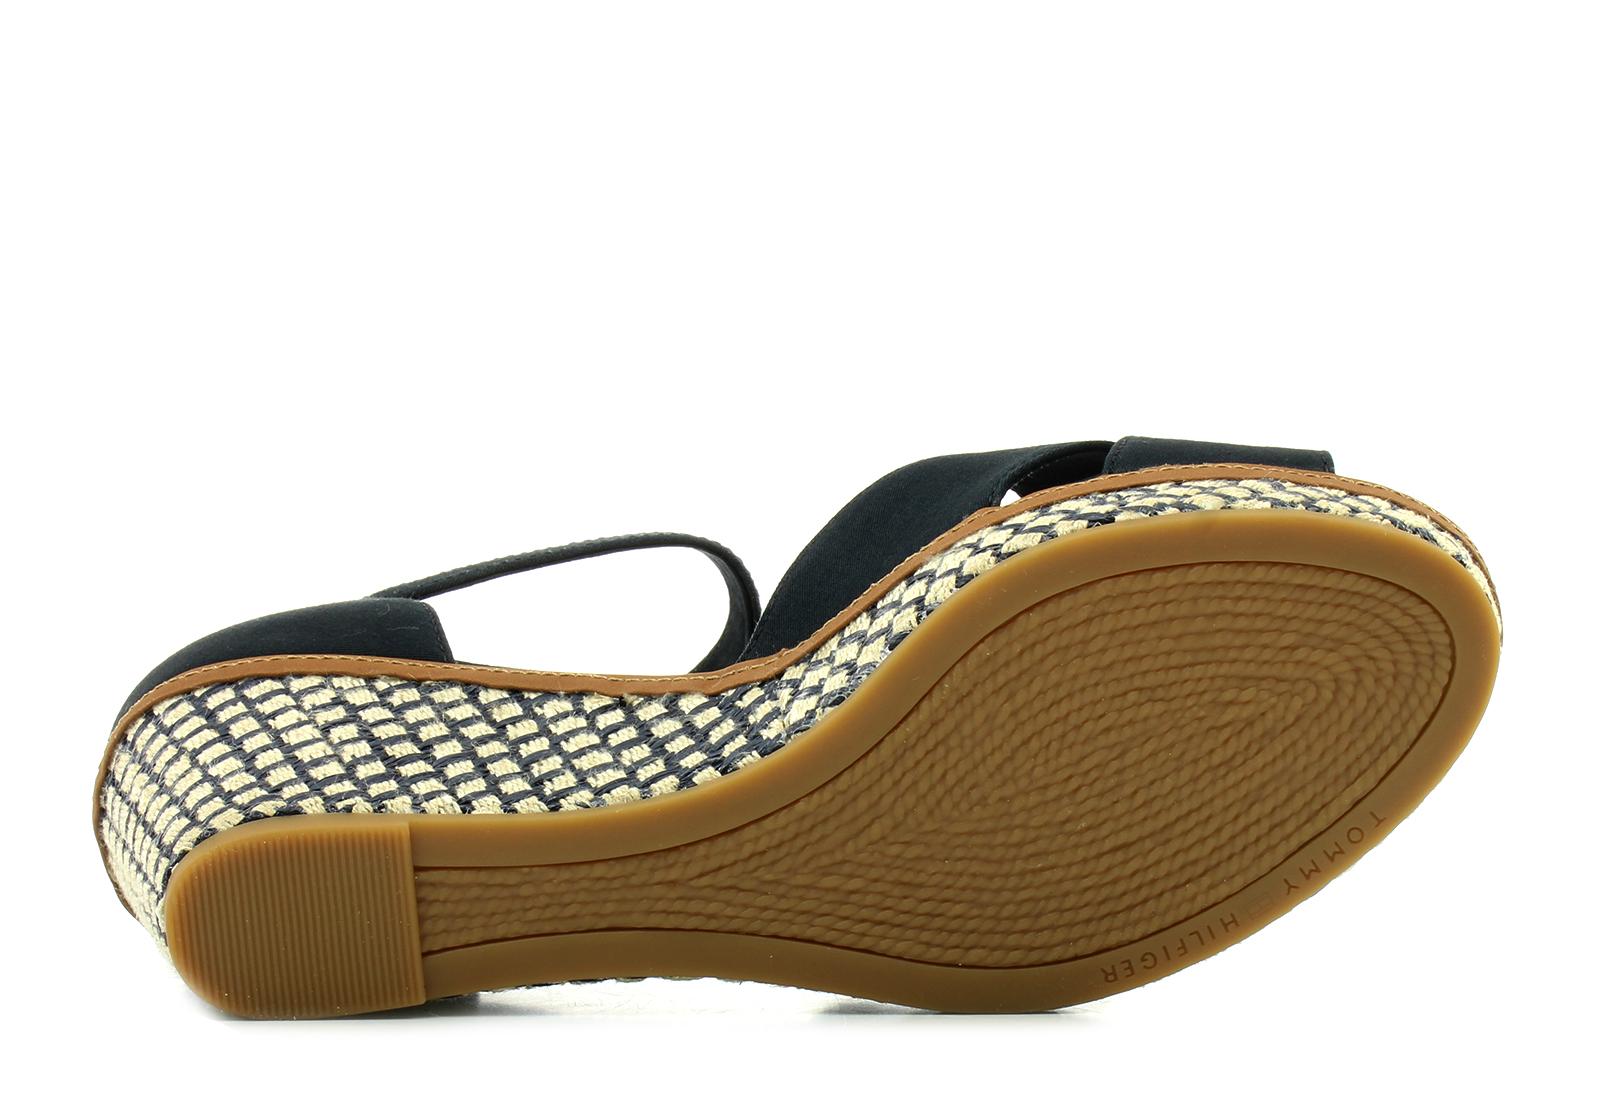 a2ff2a831c622 Tommy Hilfiger Sandale - Elba 31 - 18S-2648-403 - Office Shoes Romania